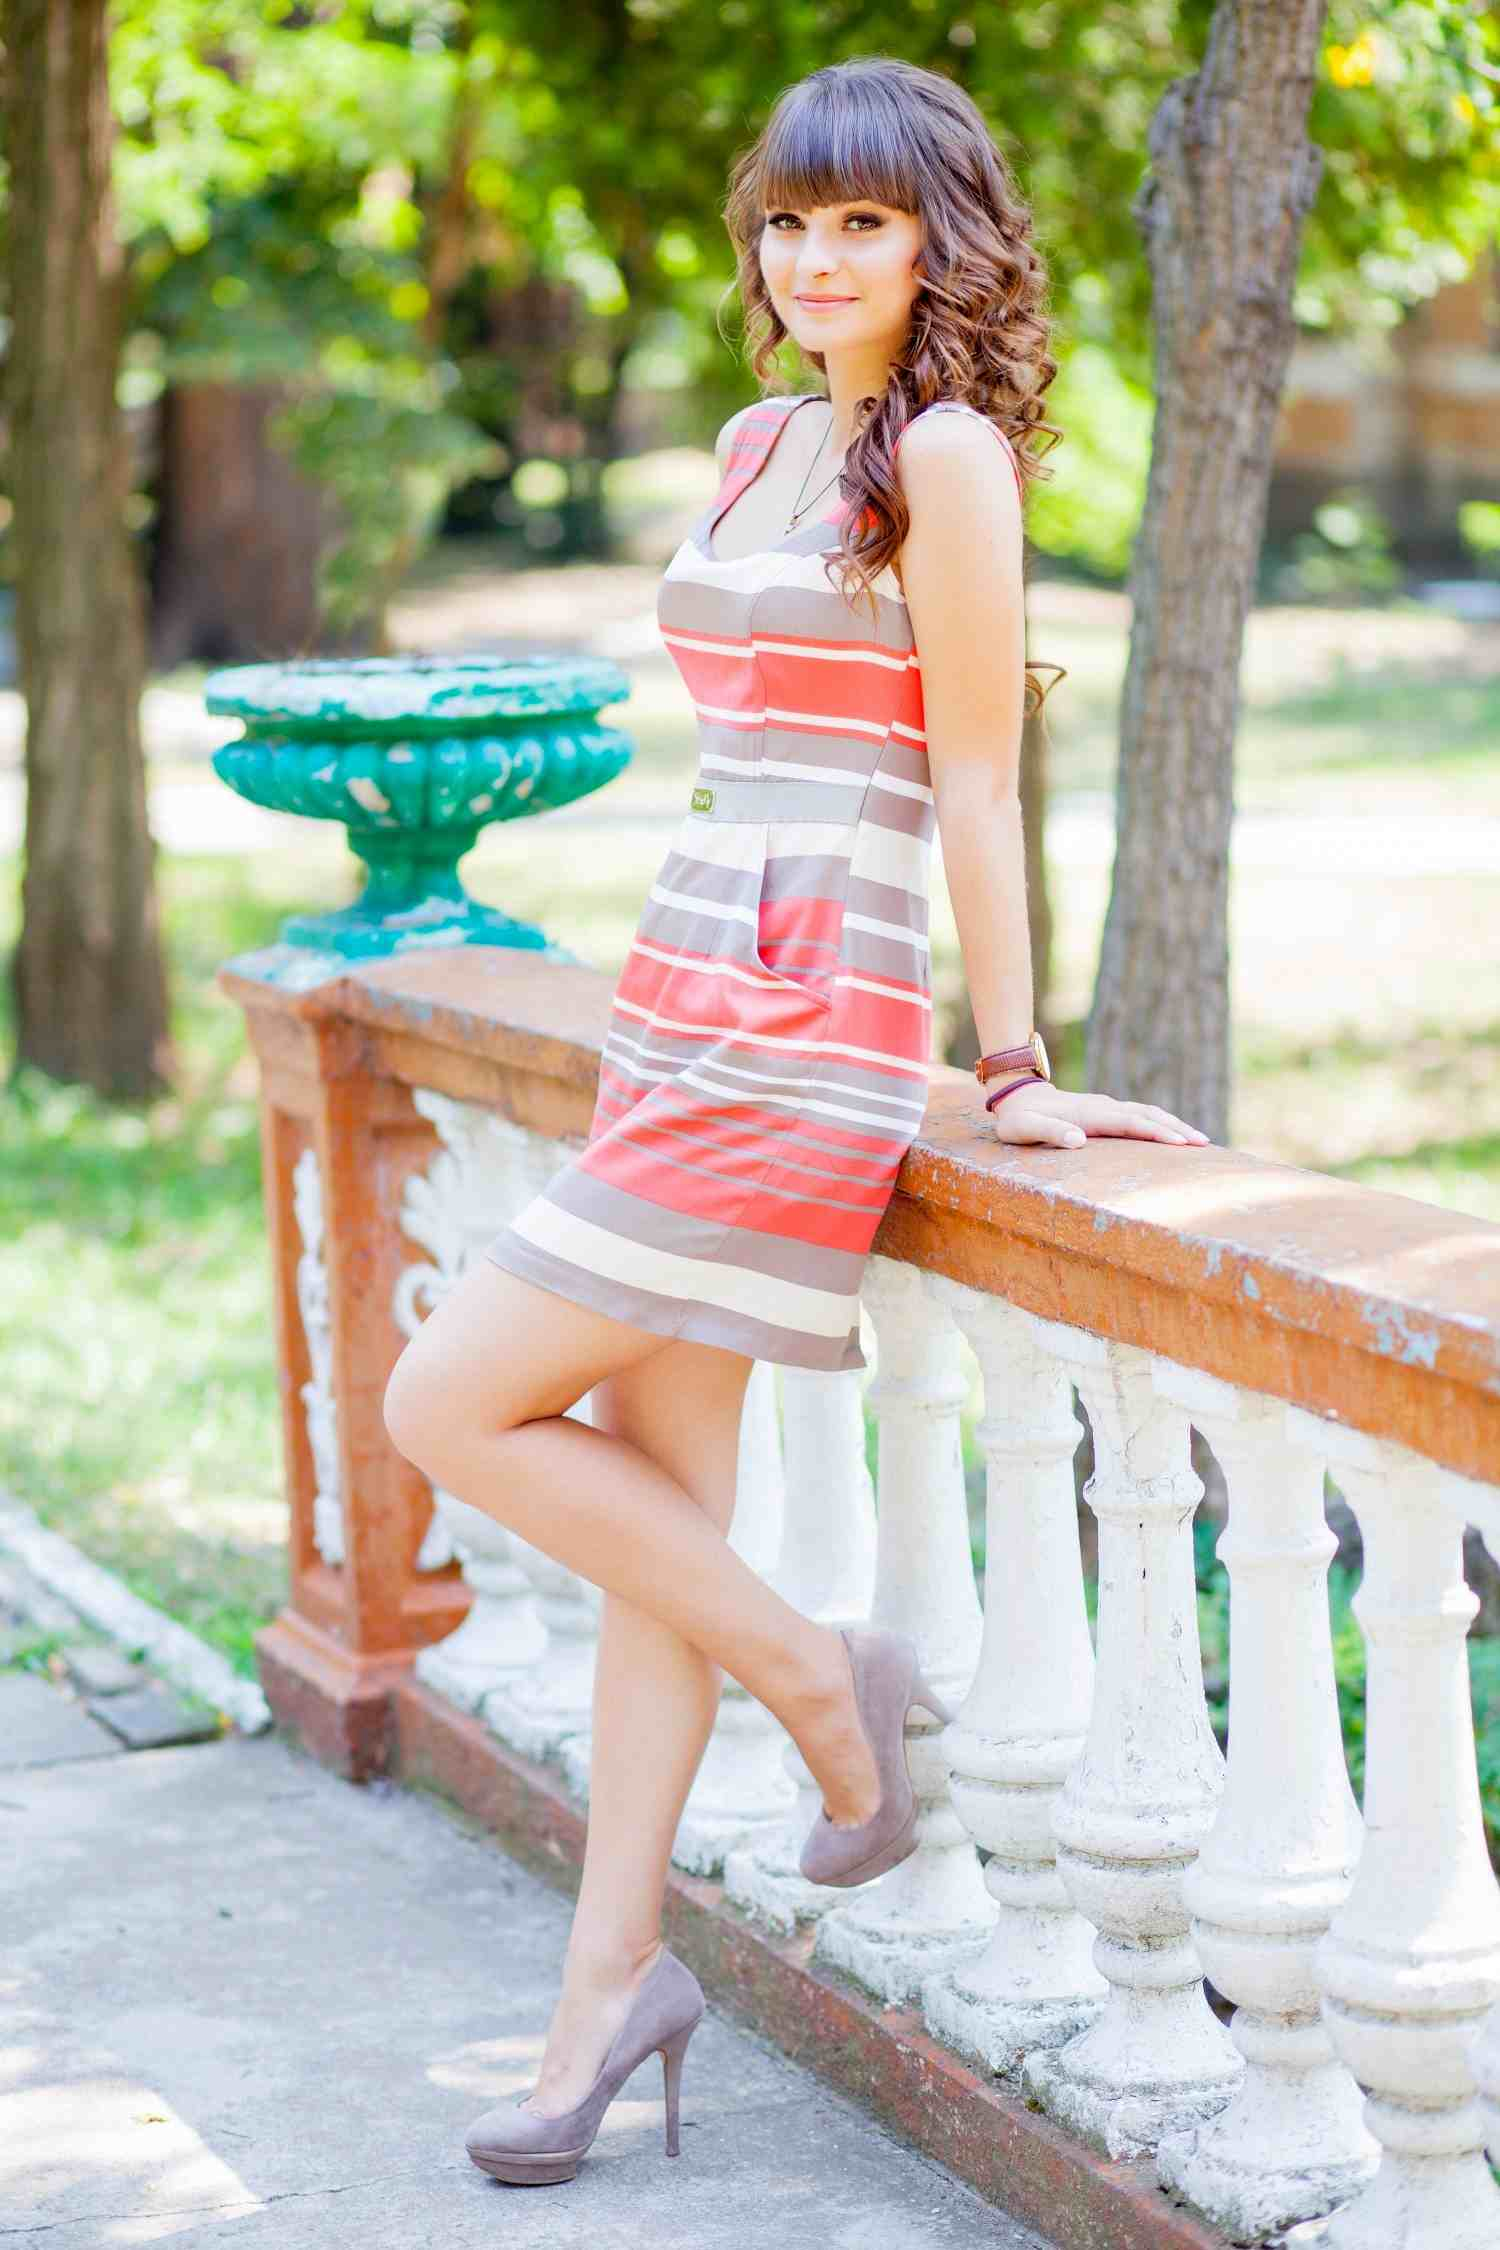 Paulina hilton